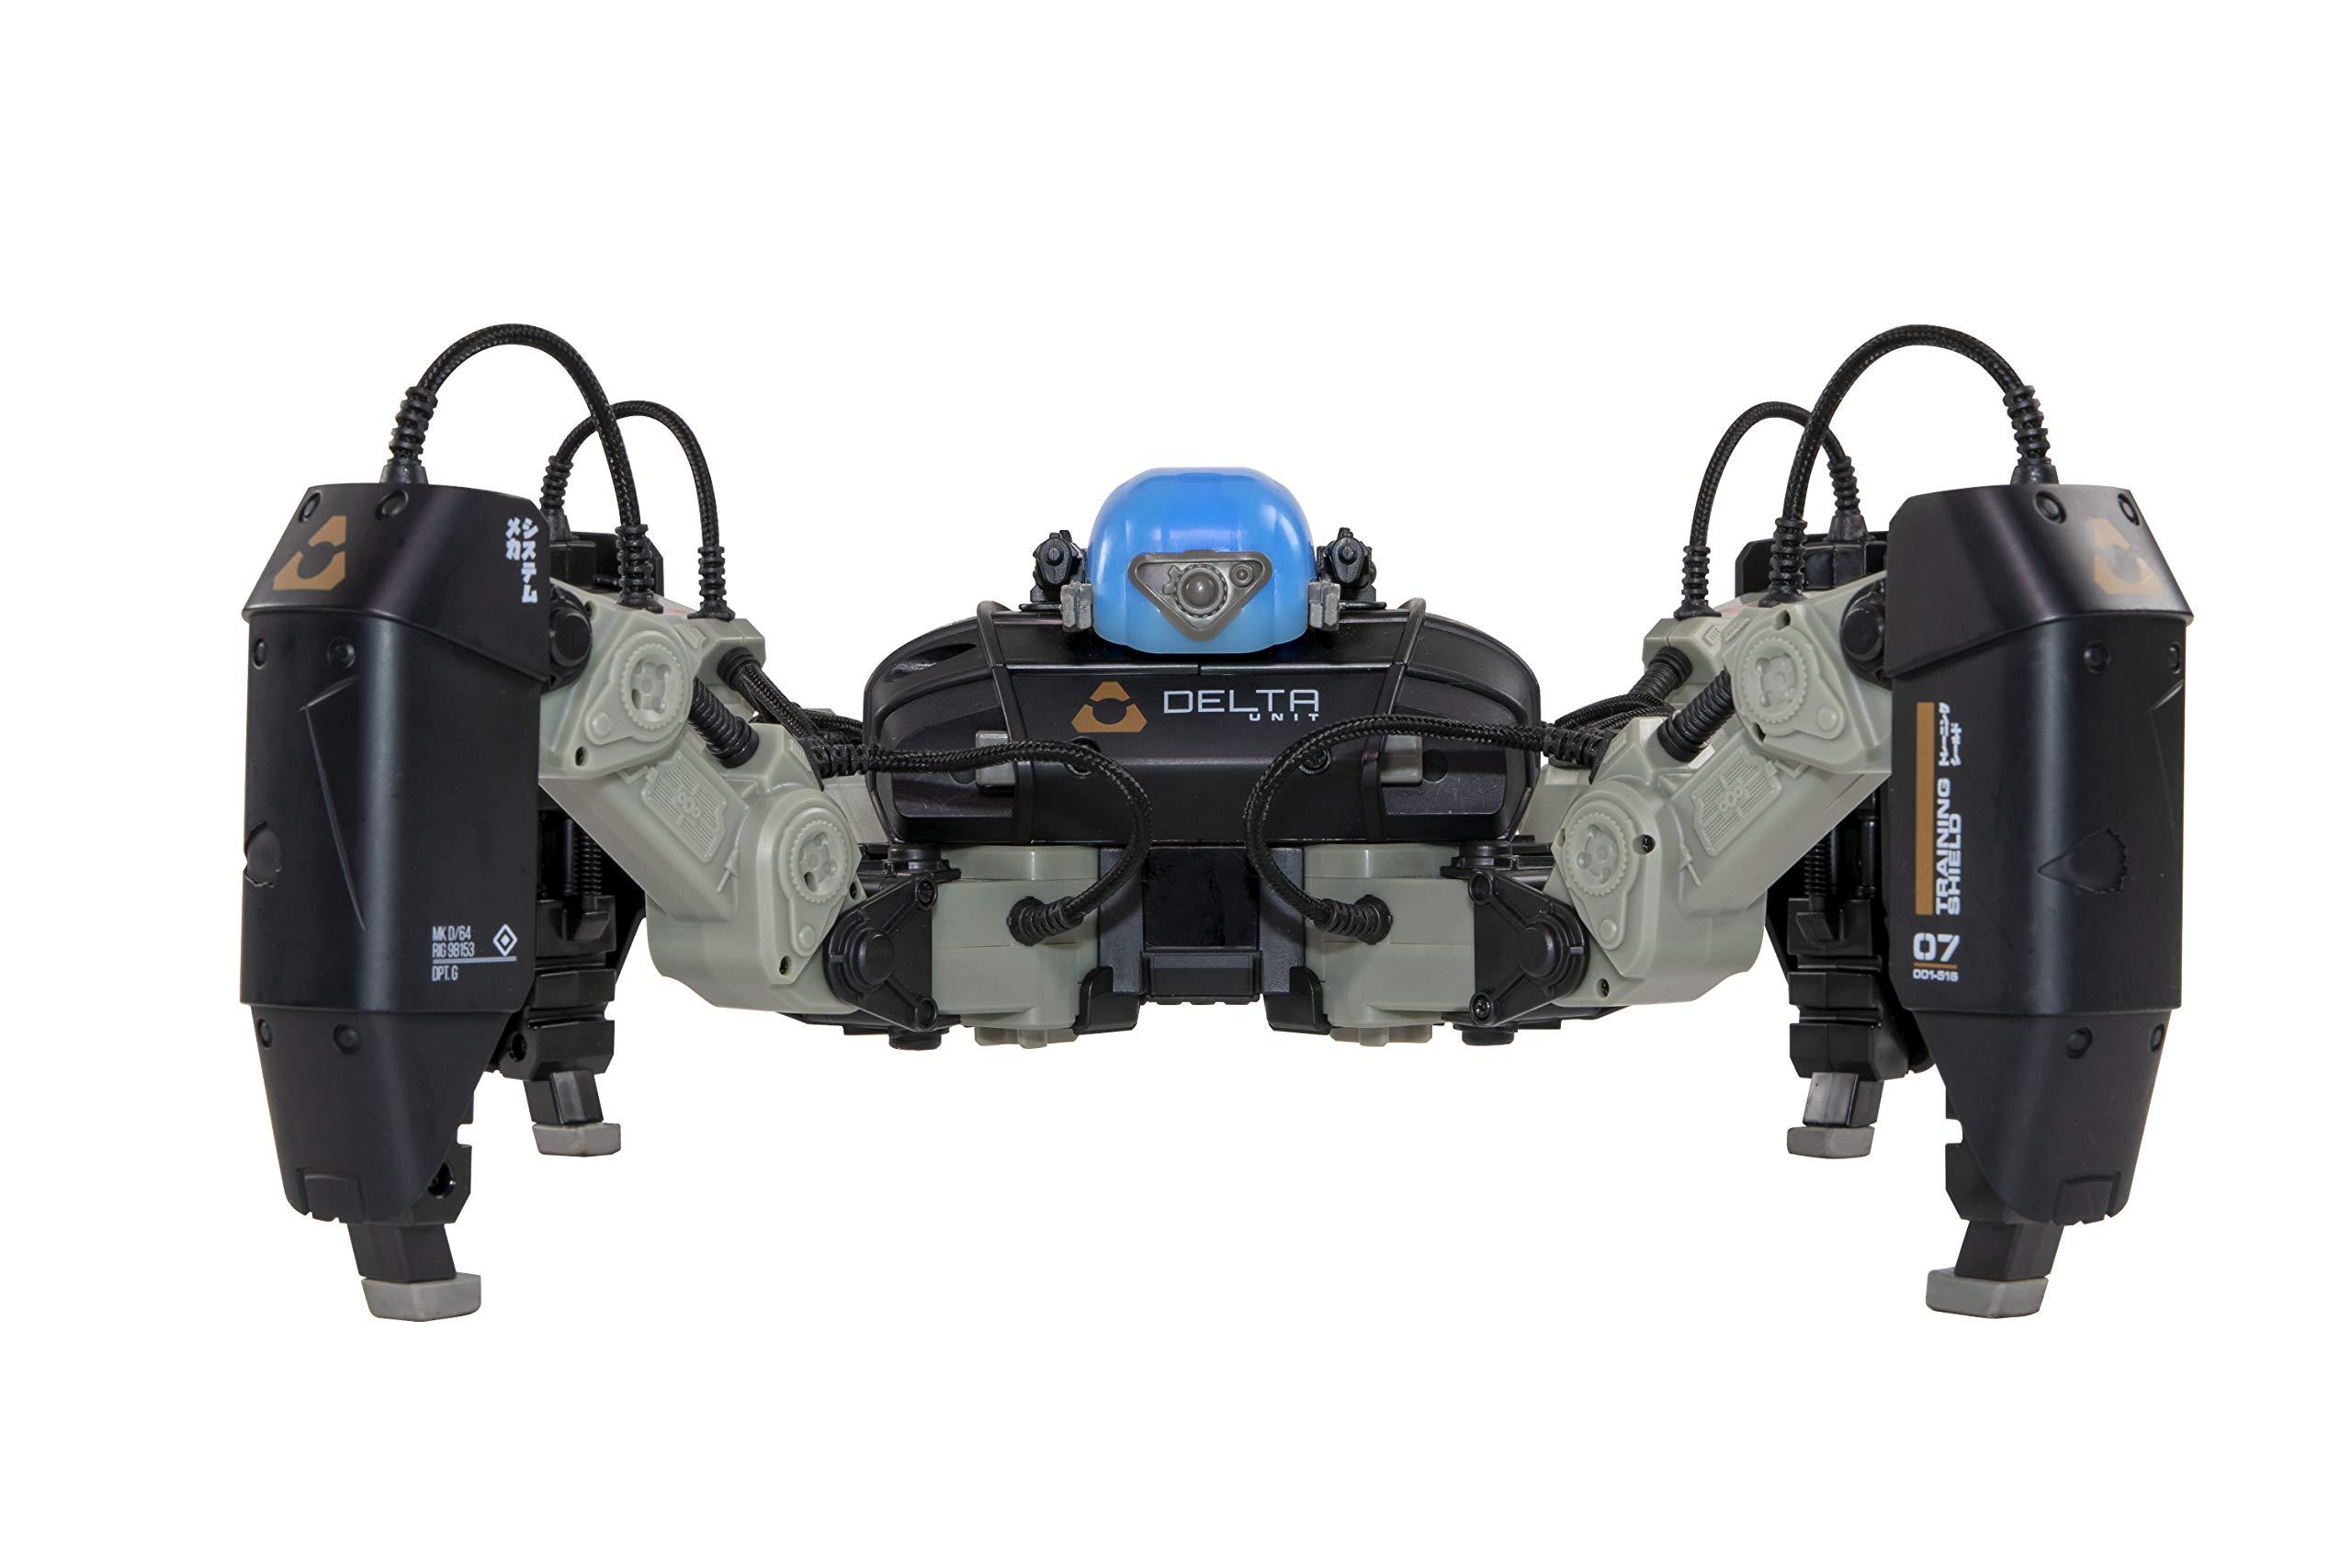 Mekamon Berserker V2 Gaming Robot - US (Black)